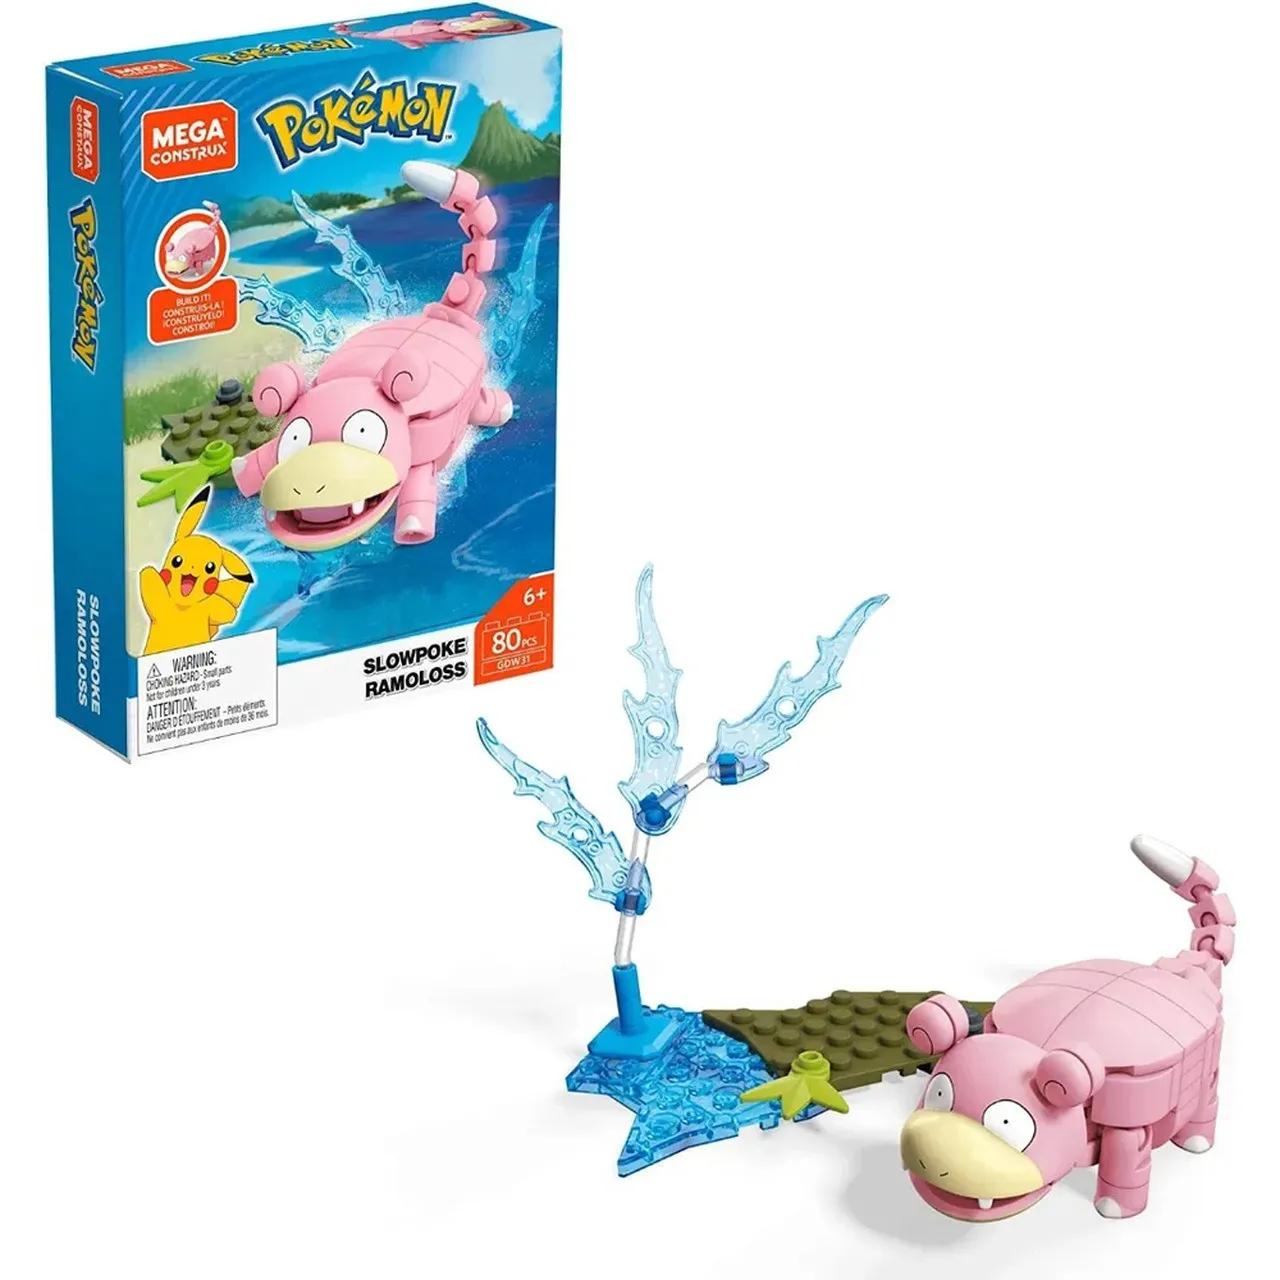 Brinquedo de Montar Pokemon Sortido GDW30 MATTEL